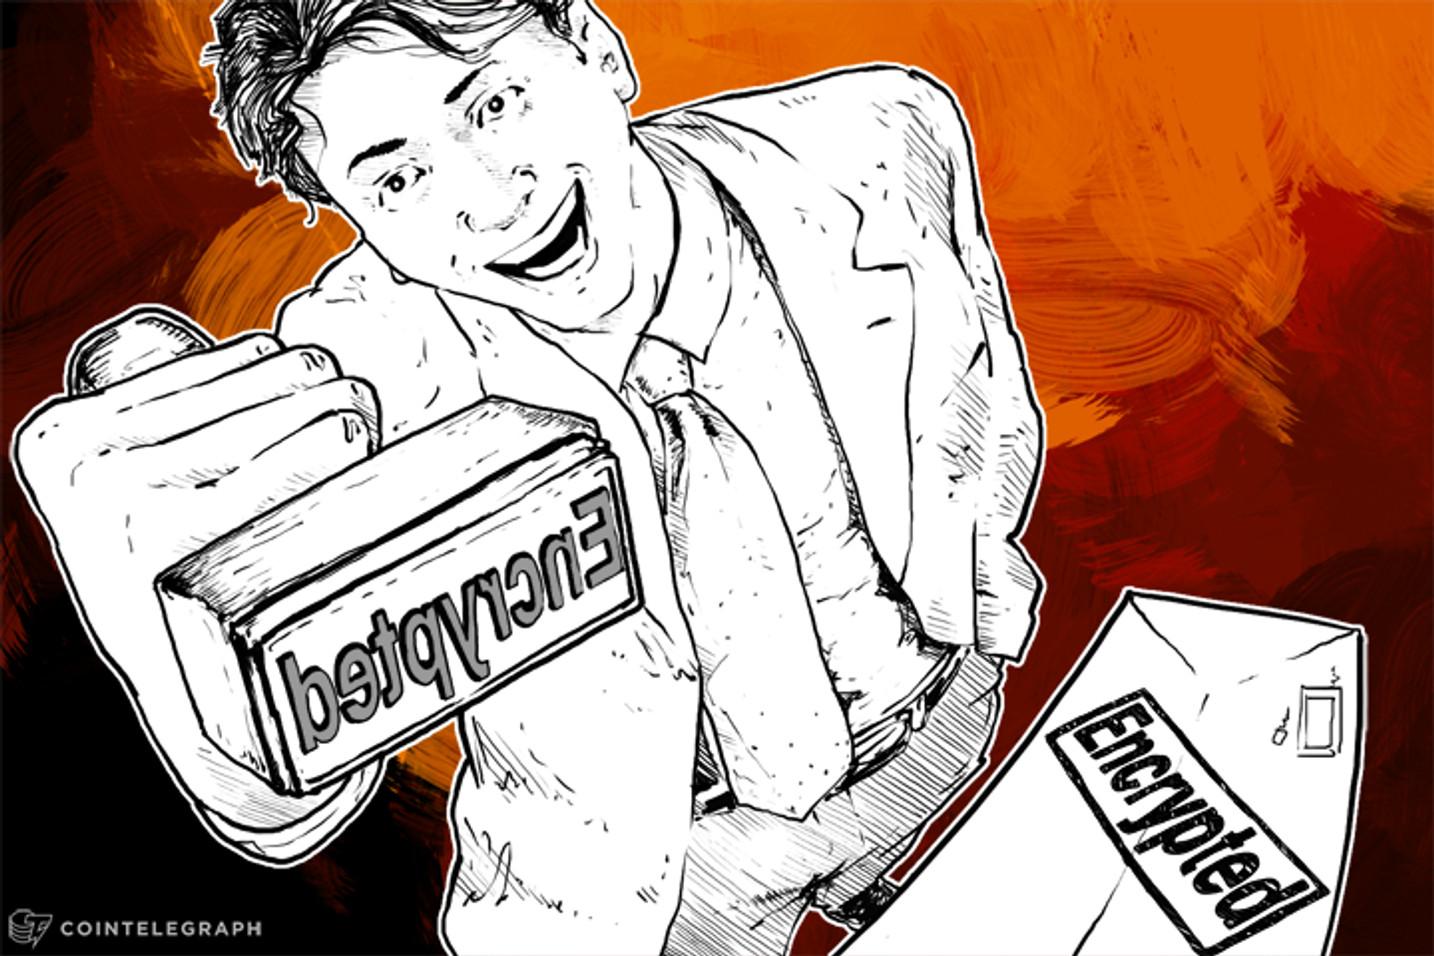 A Hack Free Internet? IAB Motions to Encrypt All The Things